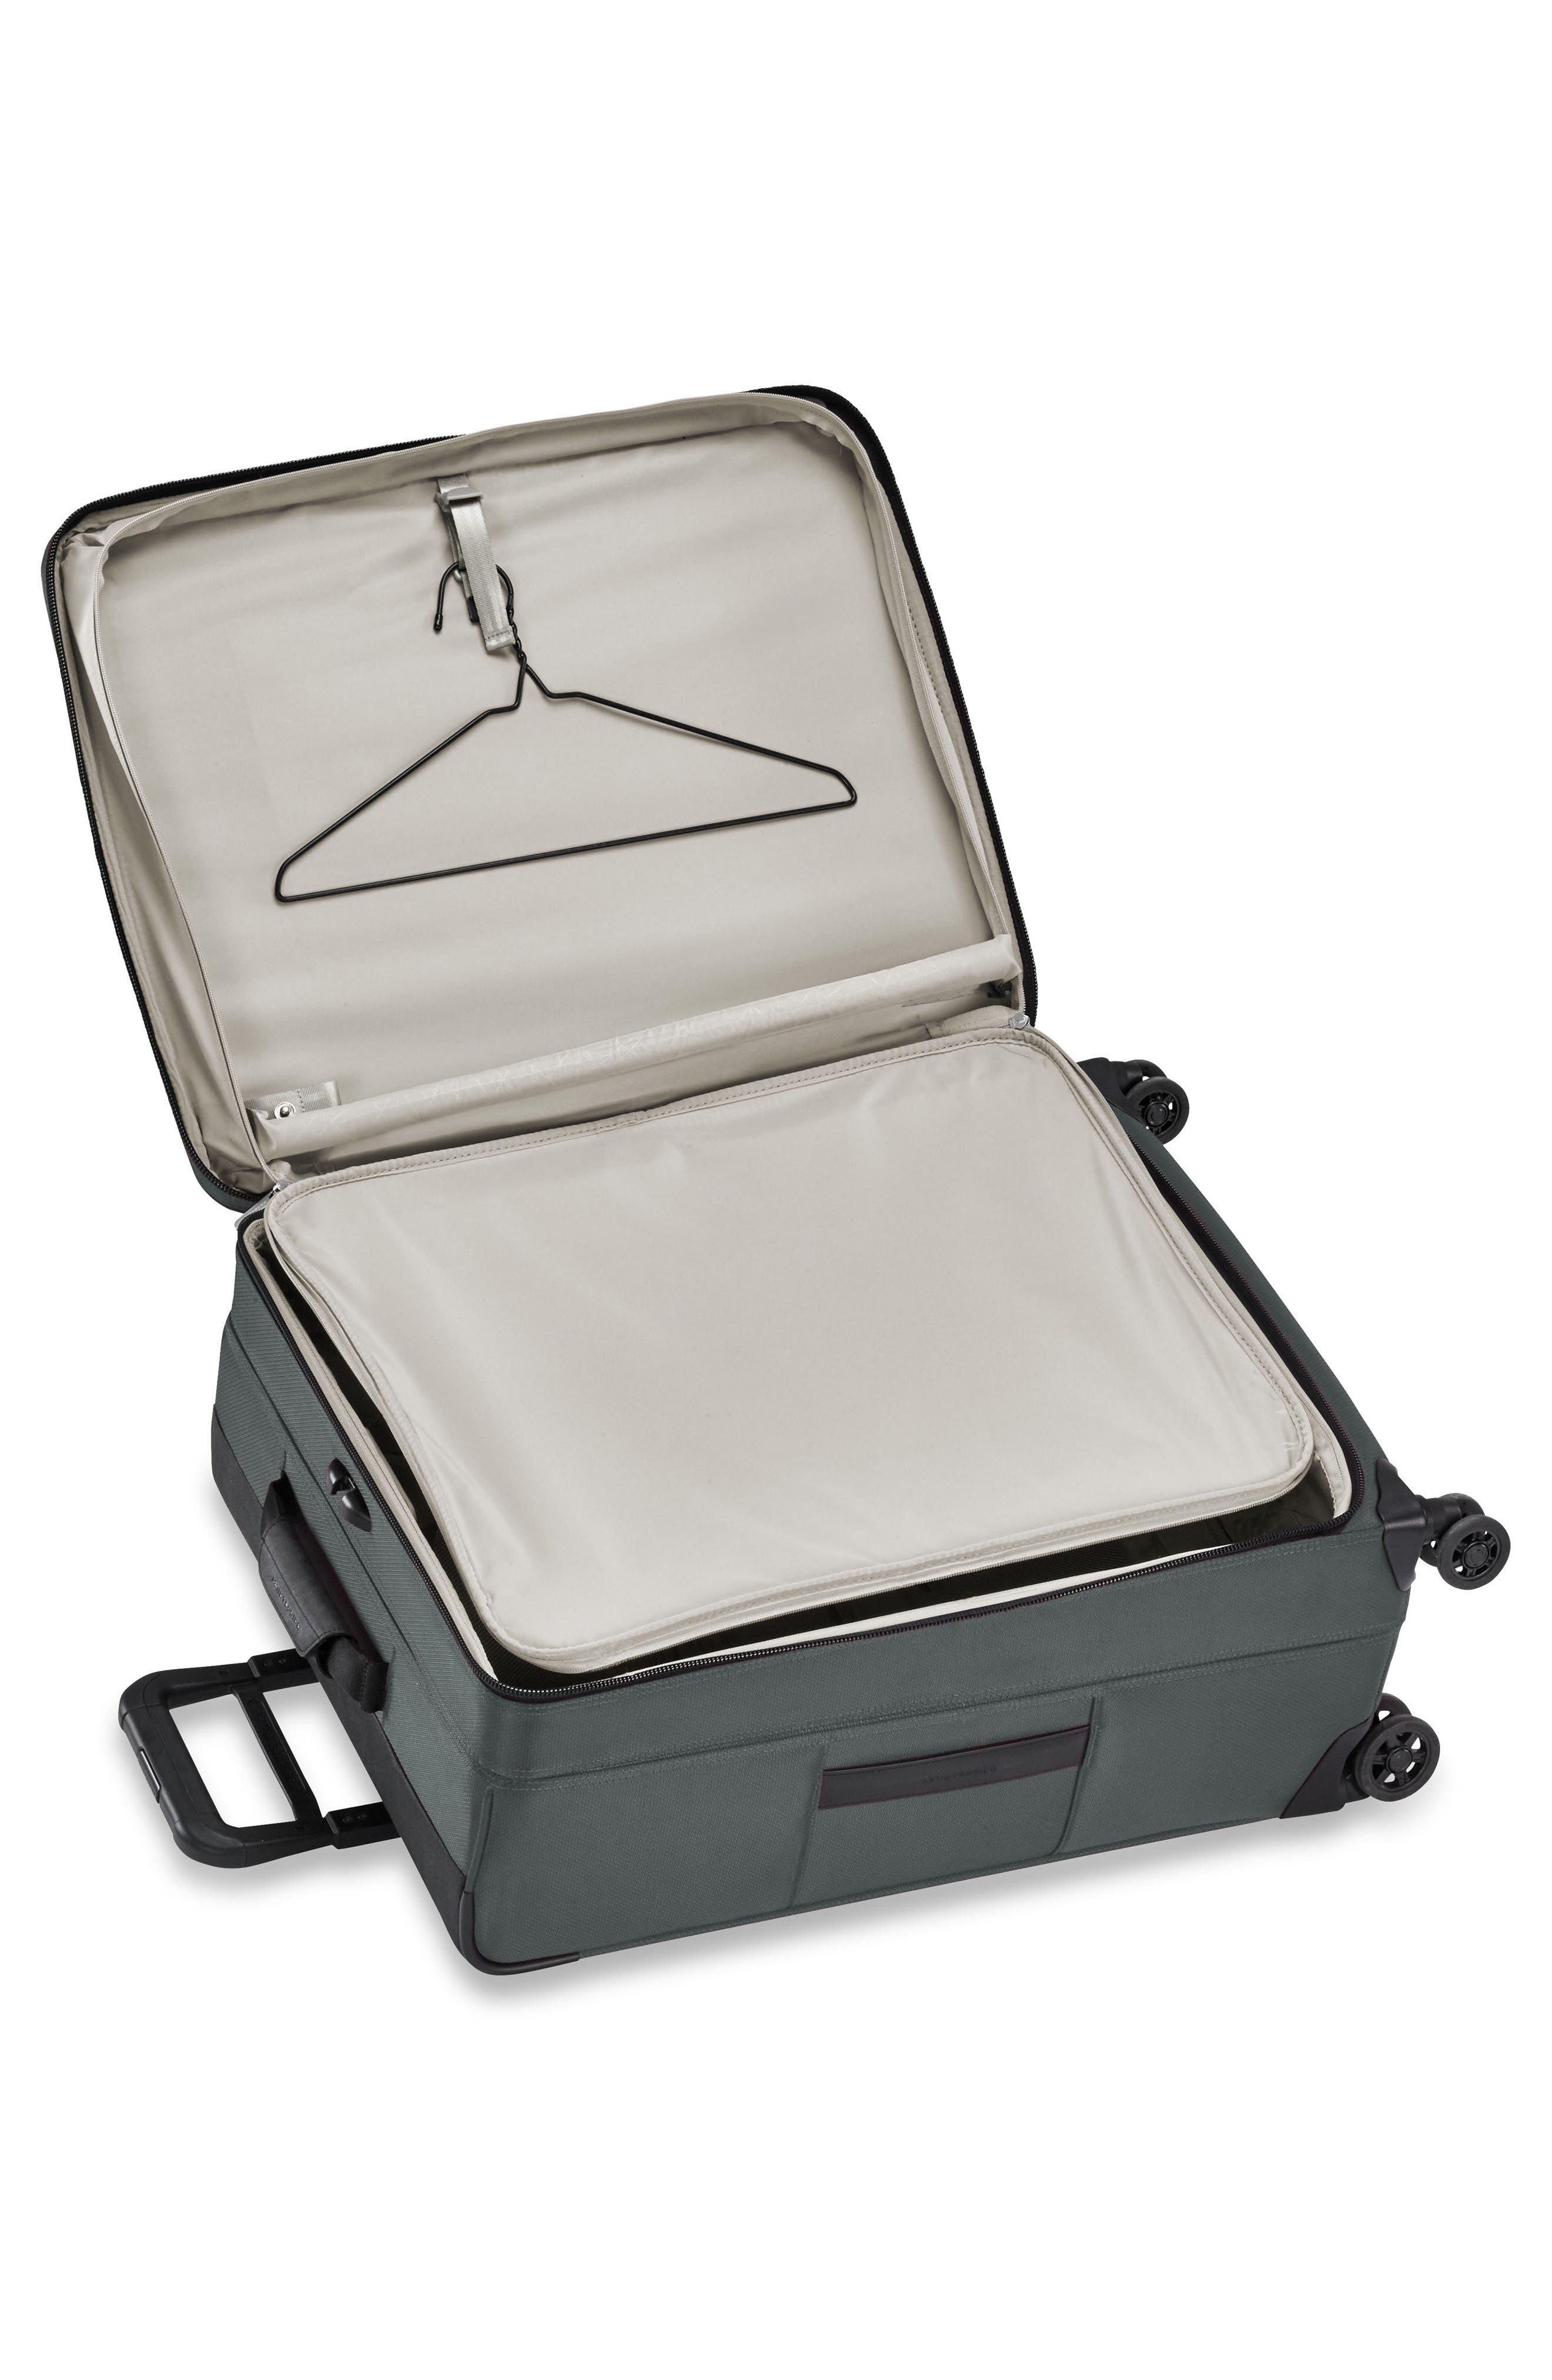 Alternate Image 2  - Briggs & Riley Transcend VX Medium Expandable 26-Inch Spinner Suitcase